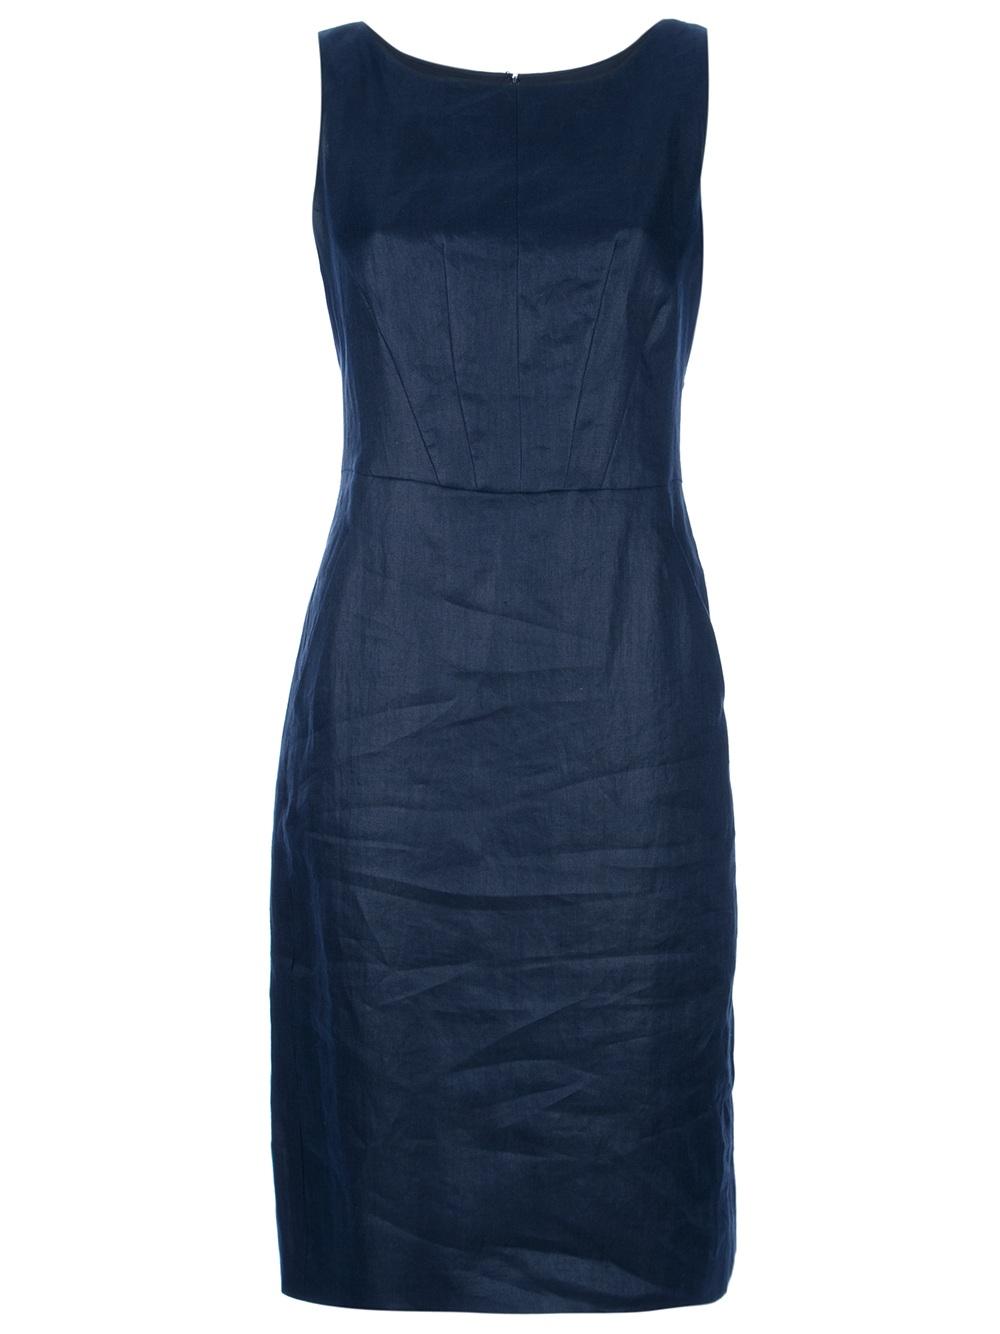 35c1829c340 Armani Linen Shift Dress in Blue - Lyst